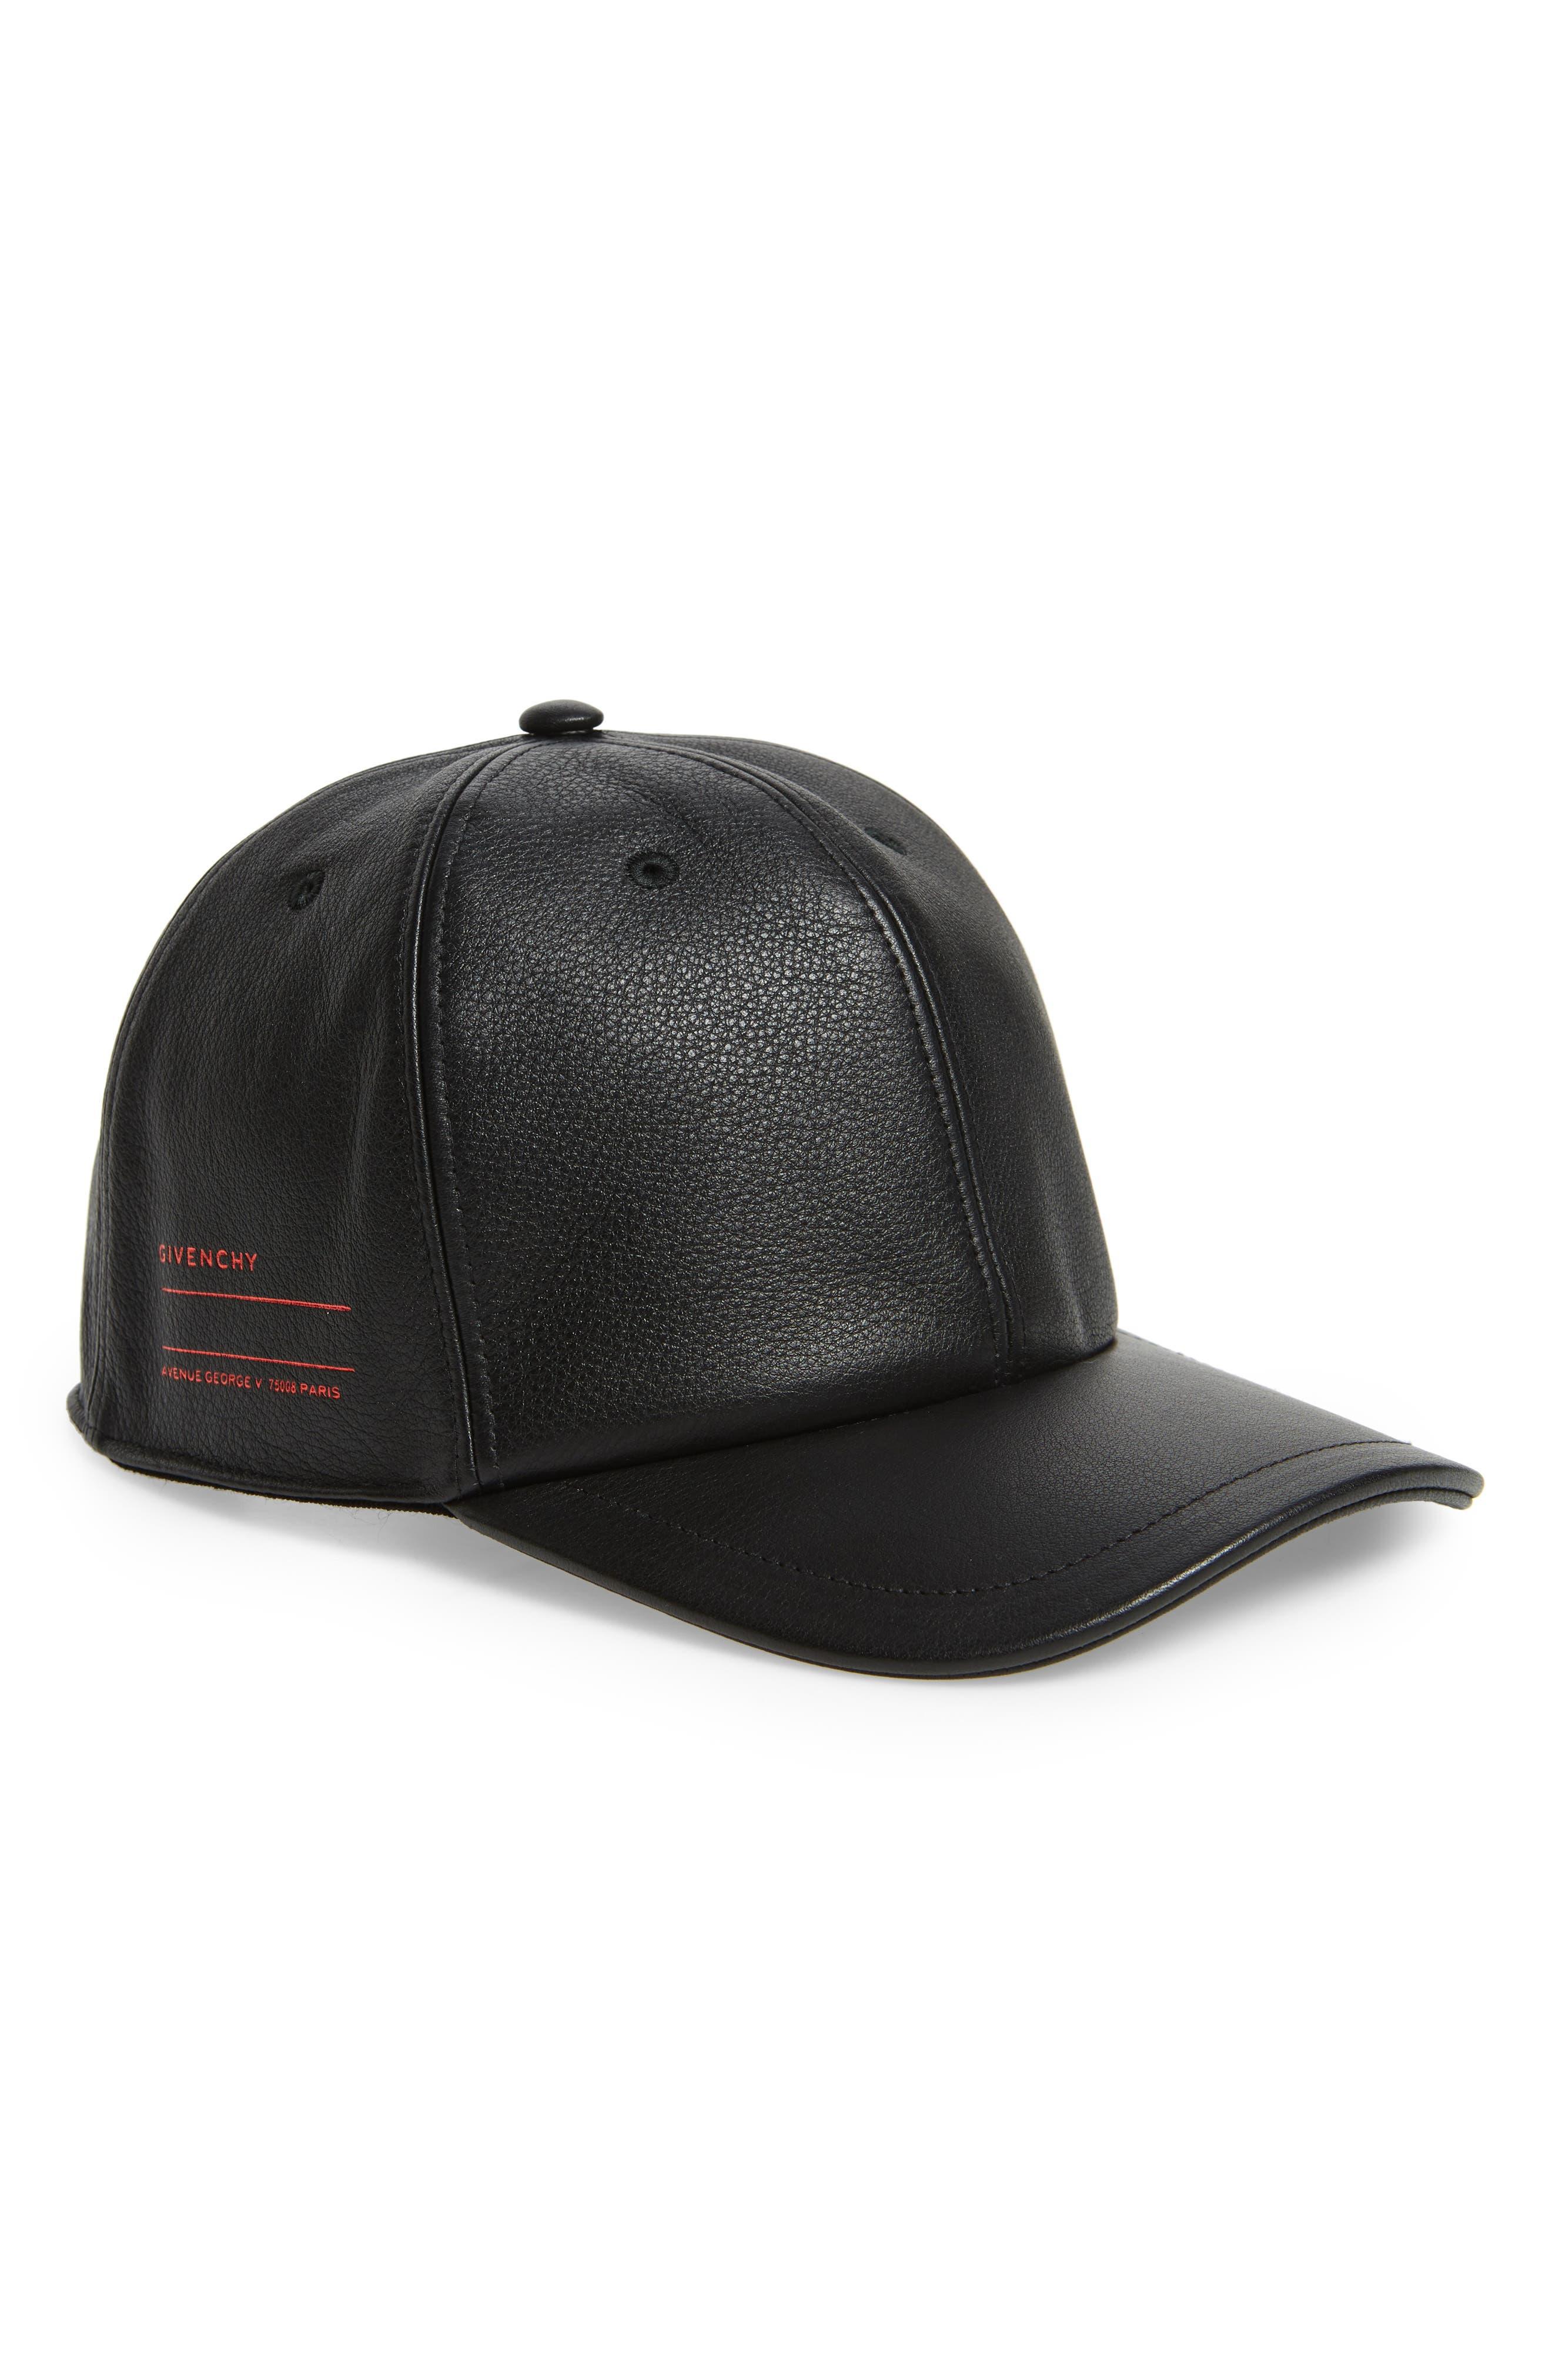 Leather Ball Cap,                             Main thumbnail 1, color,                             005